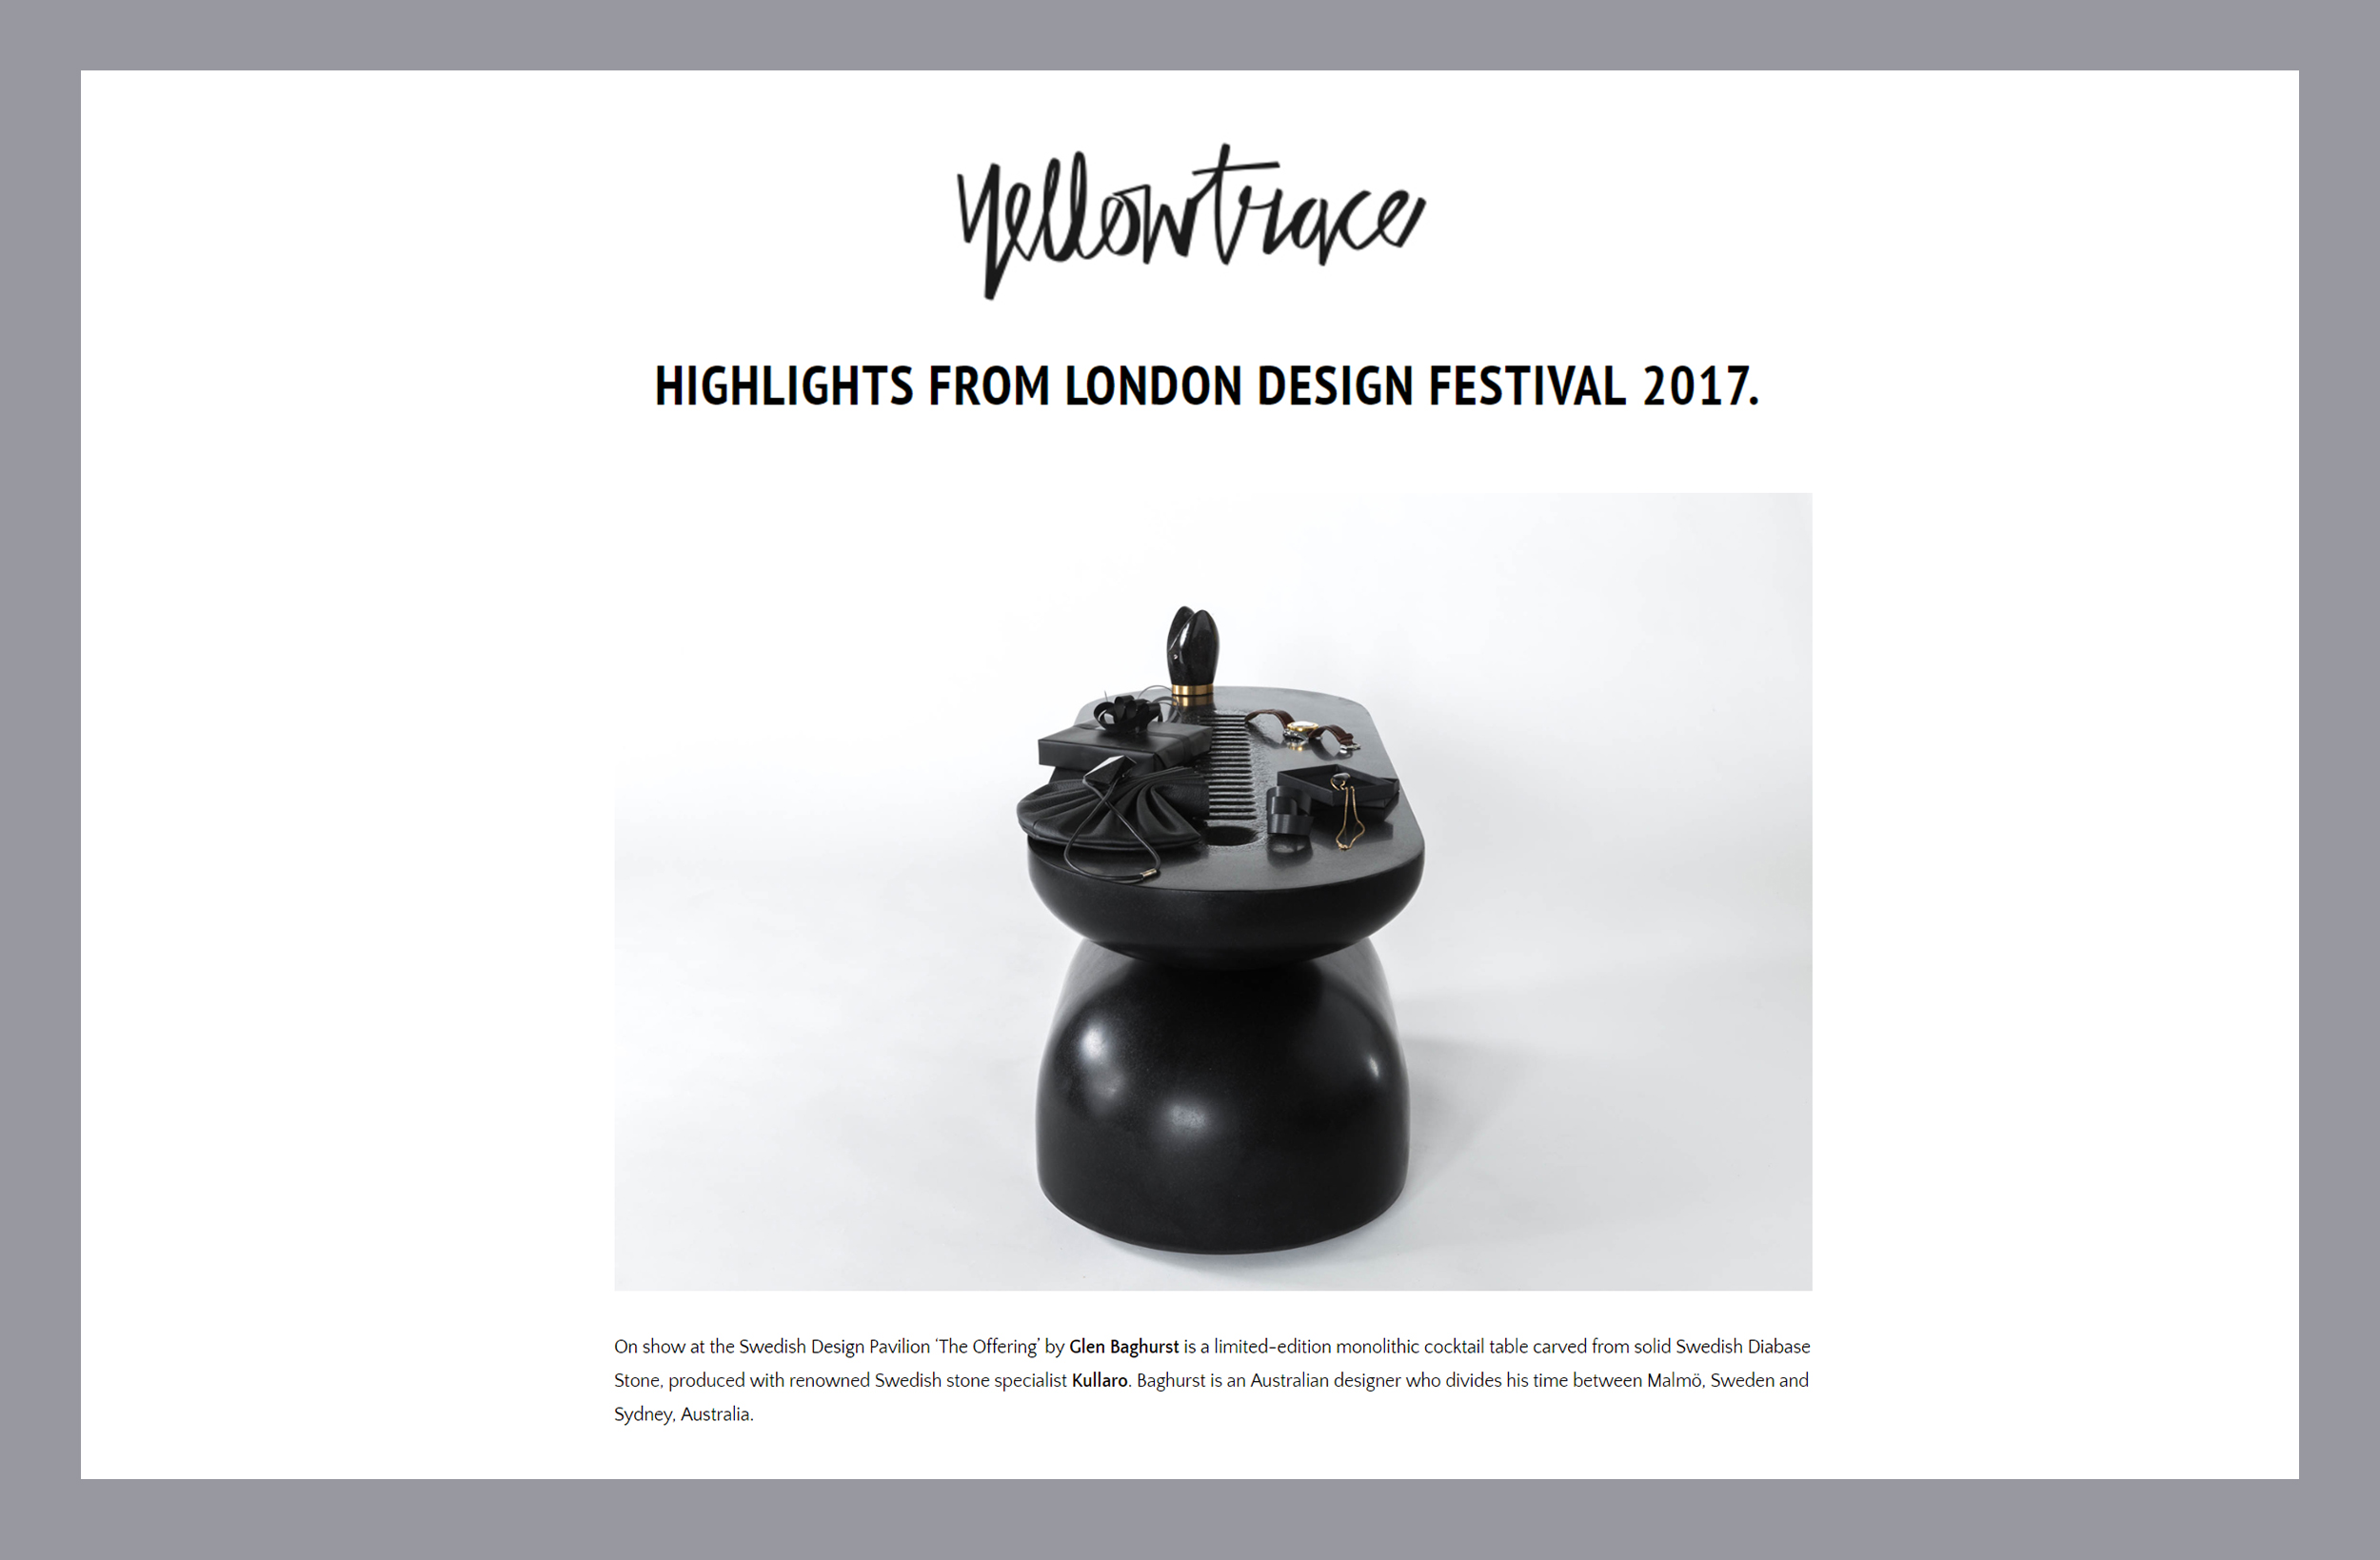 Yellowtrace London Design Festival HIghlights 2017